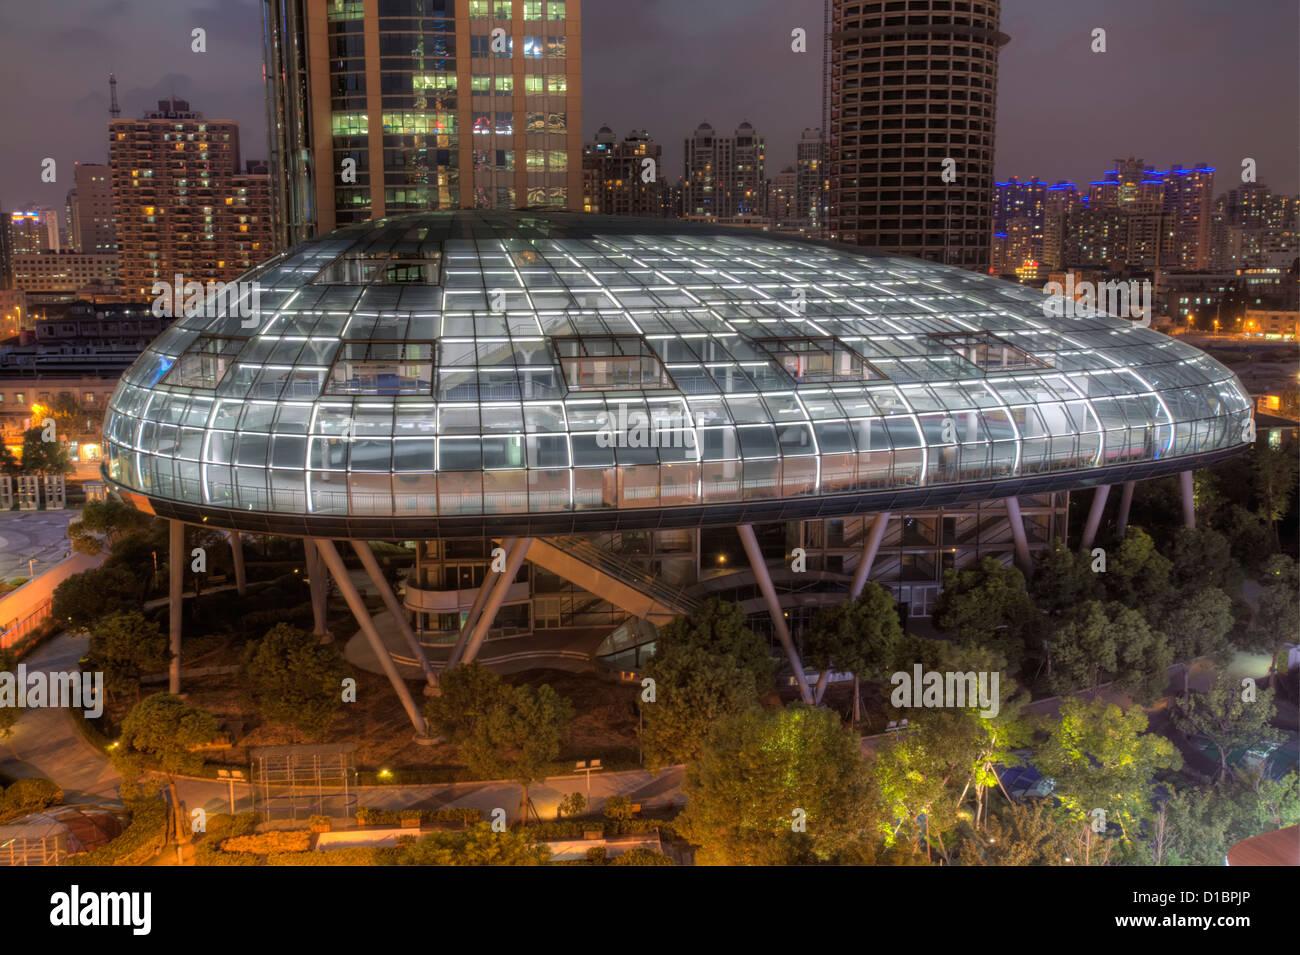 Die internationalen Kreuzfahrt-Terminal, Shanghai, China. Stockbild